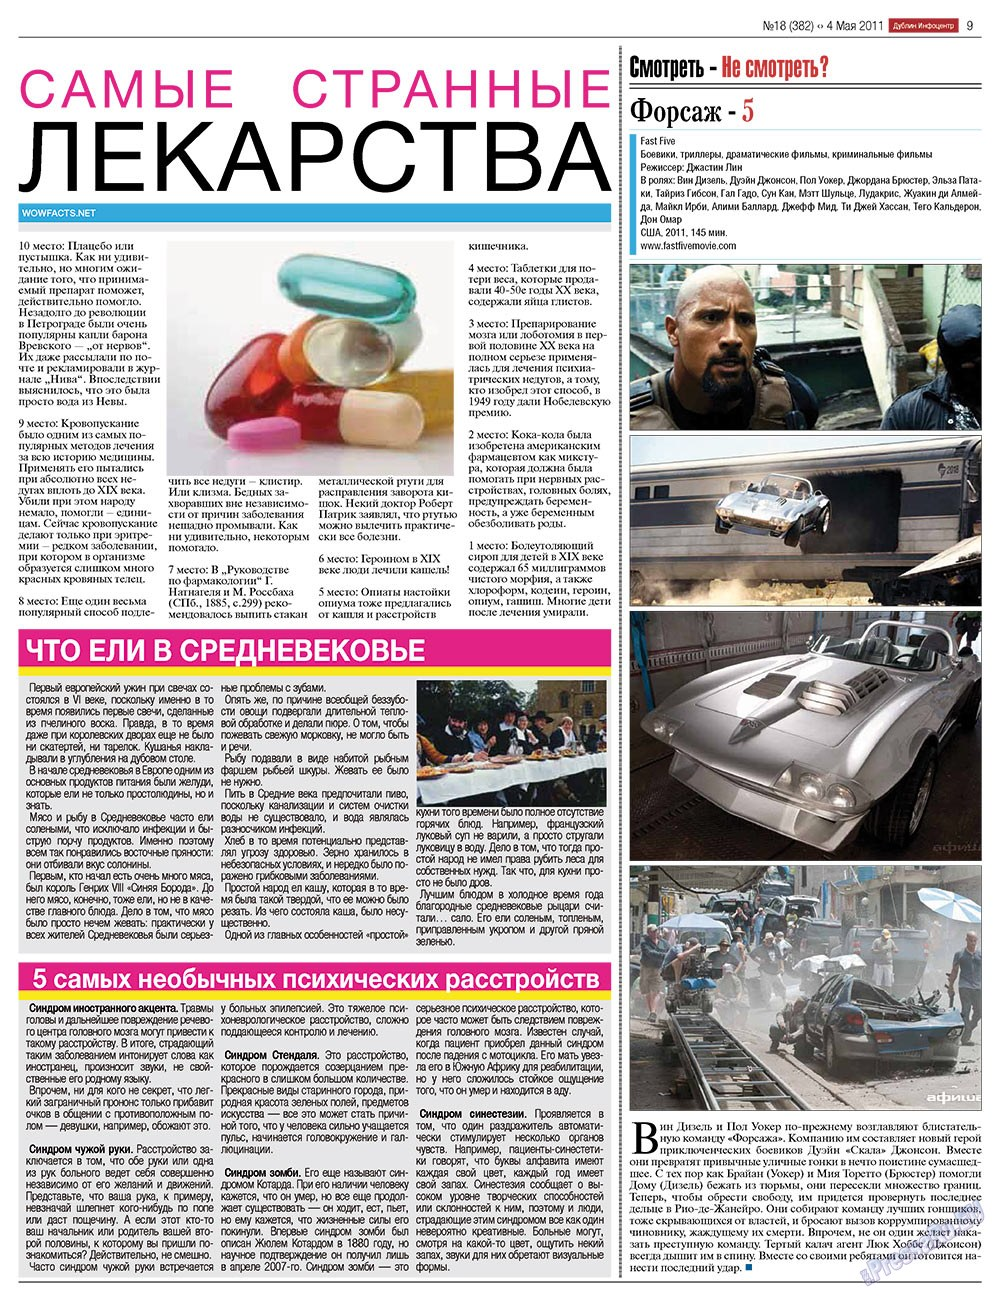 Дублин инфоцентр (газета). 2011 год, номер 18, стр. 9